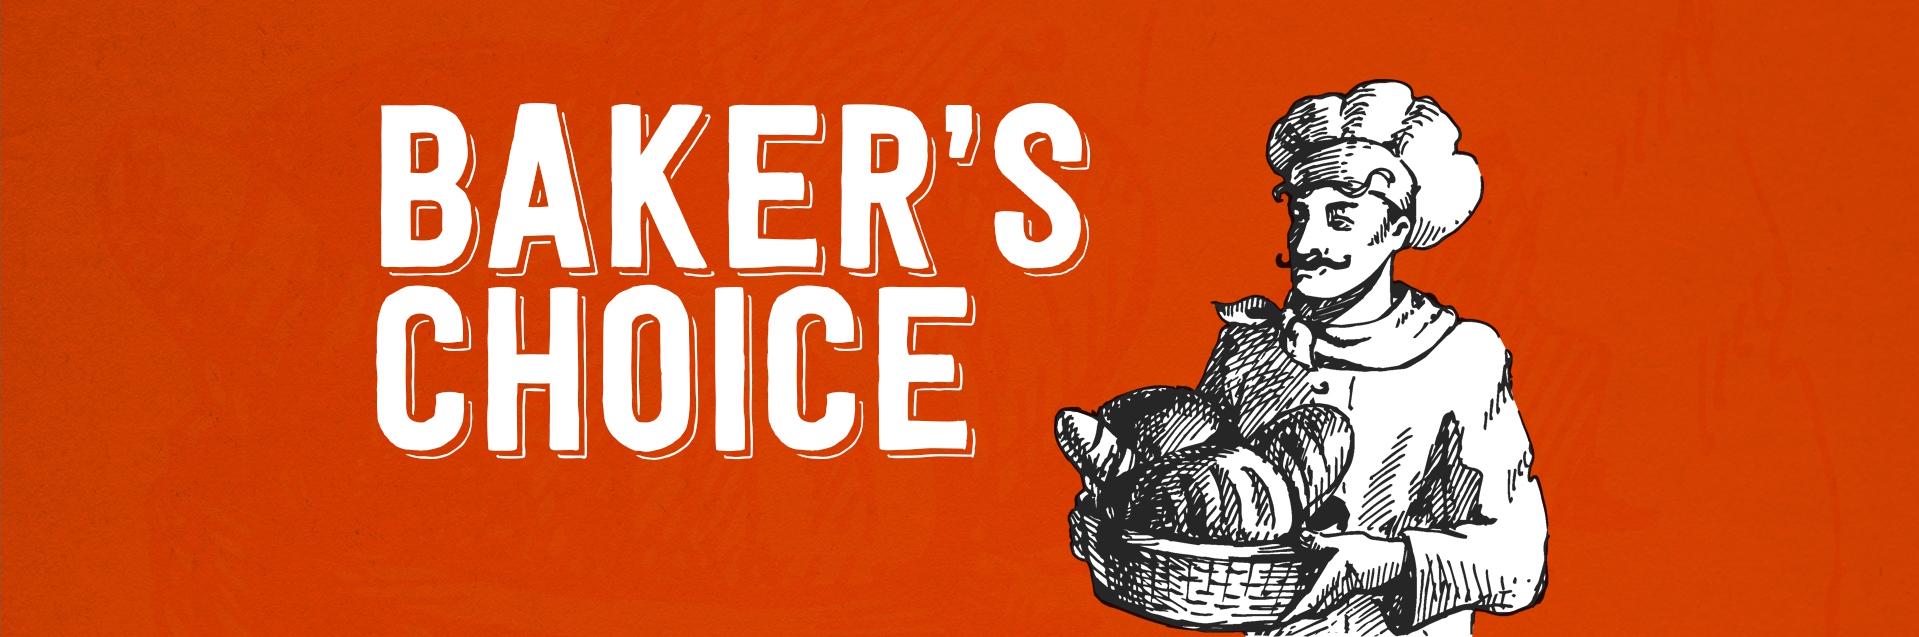 Bakers Choice header logo